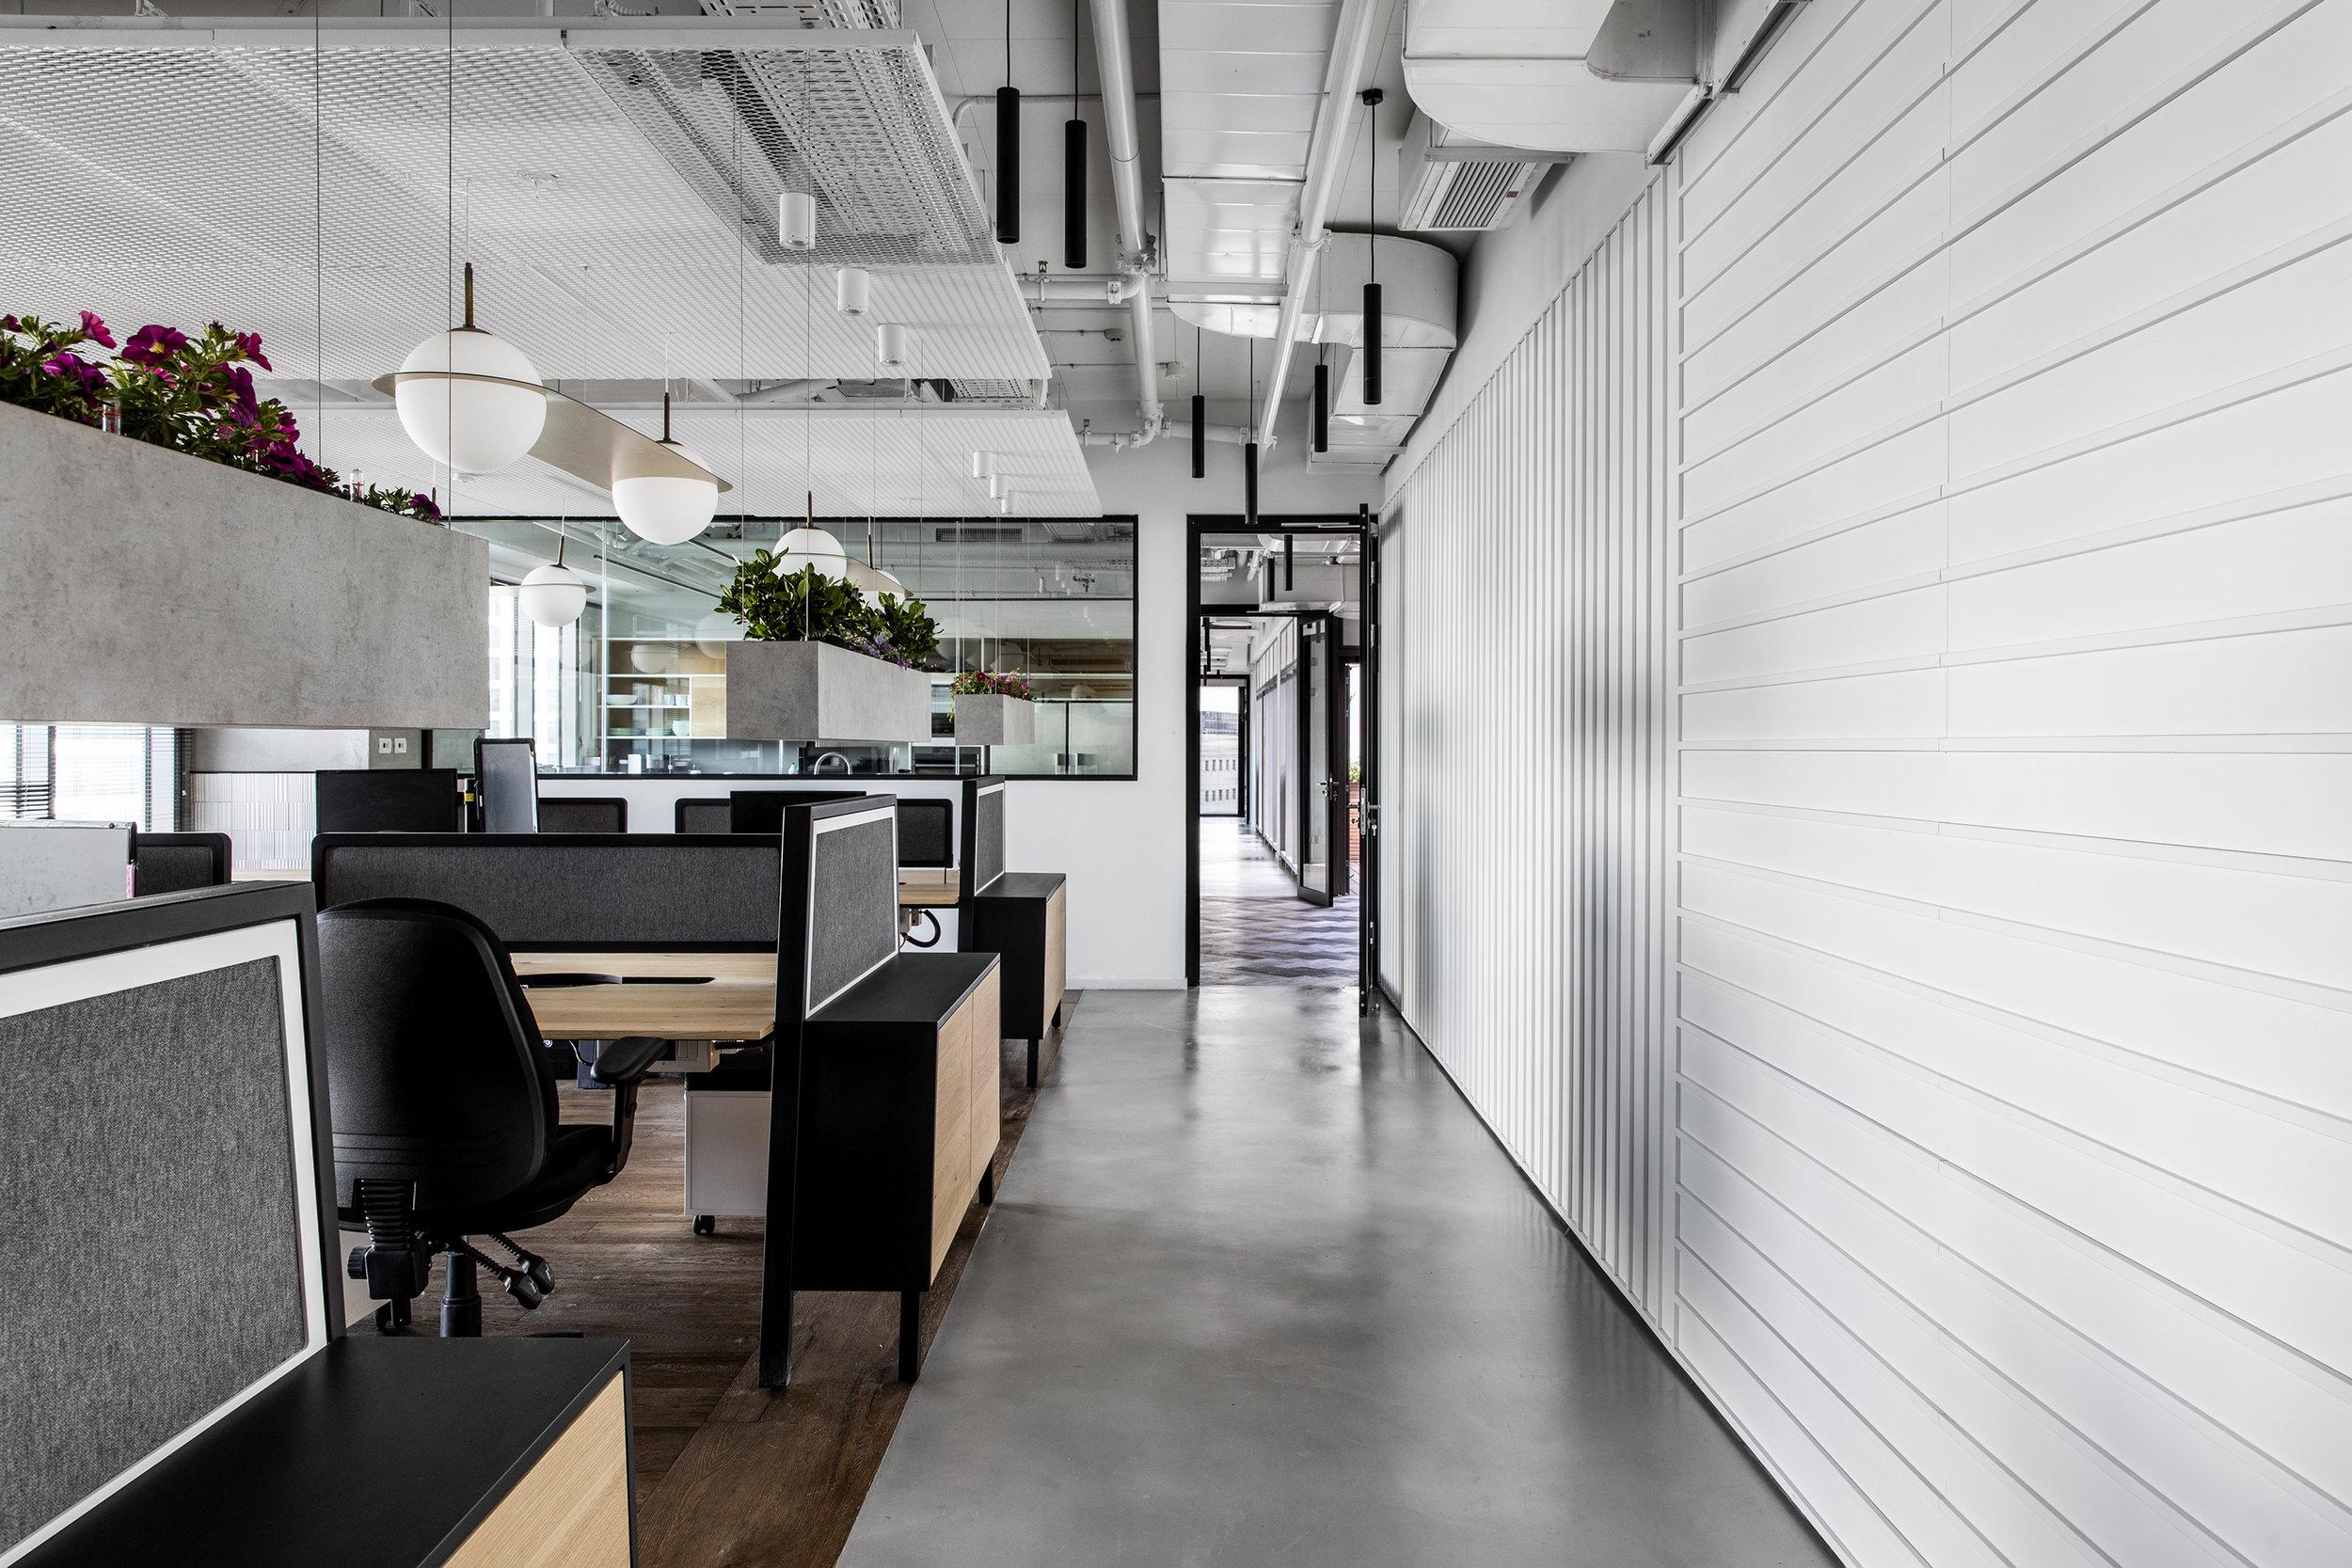 R2NET OFFICES - ROY DAVID ARCHITECTURE  STUDIO - רואי דוד אדריכלות סטודיו אדריכלים - אר2נט (1).jpg